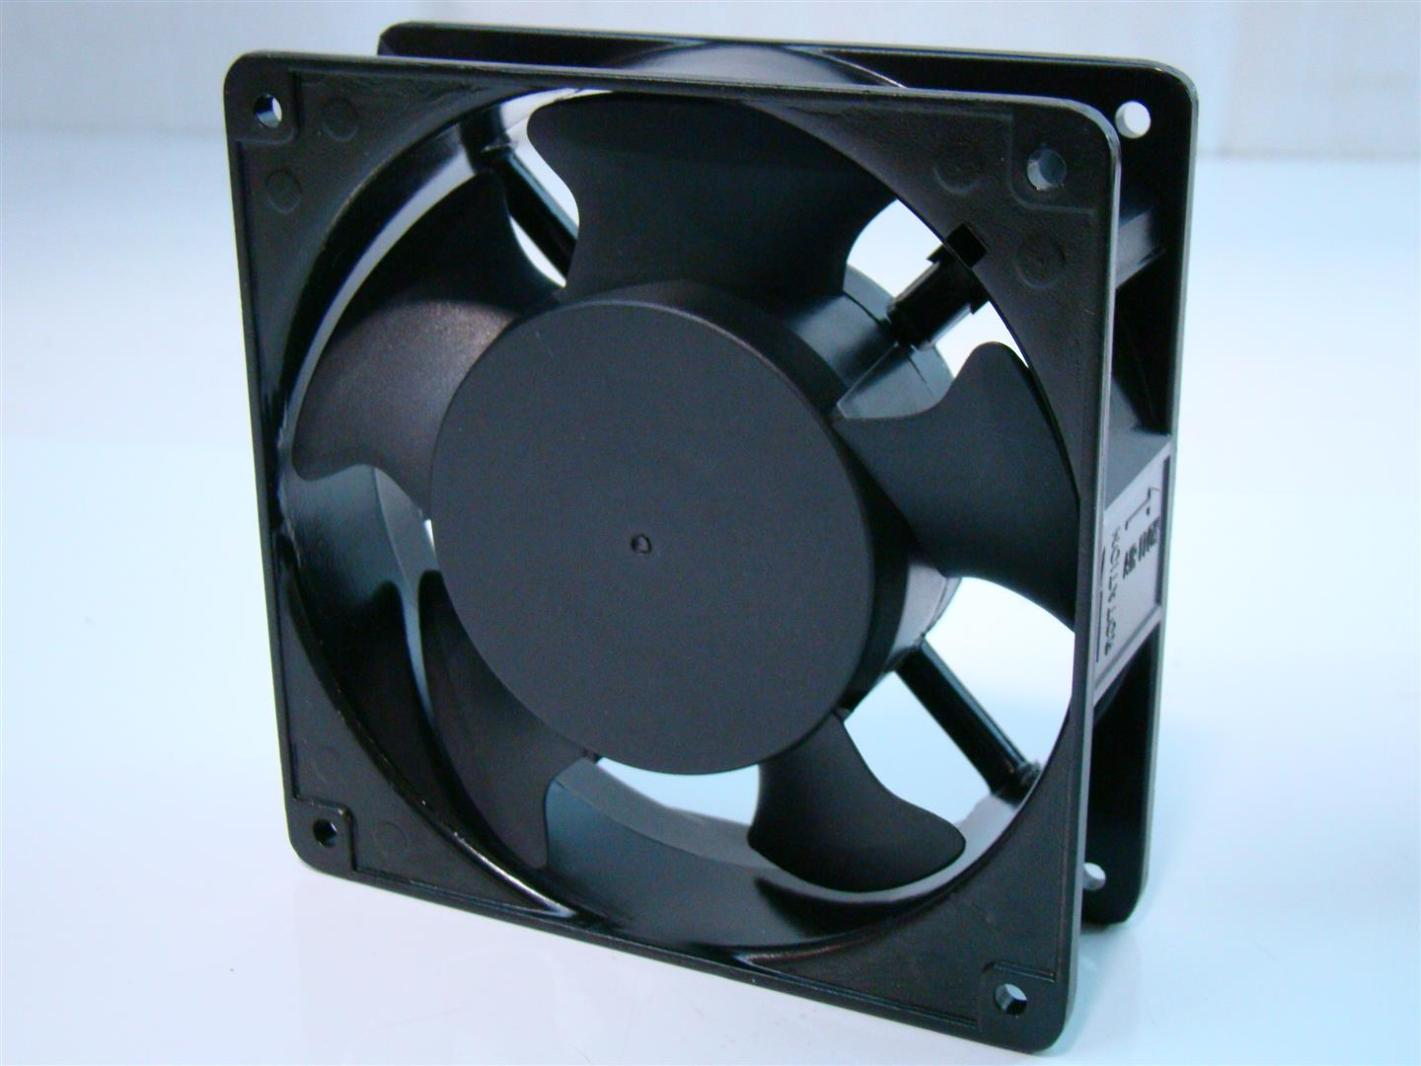 Ac Axial Fan : Dayton cfm ac axial fan rpm amps watts v